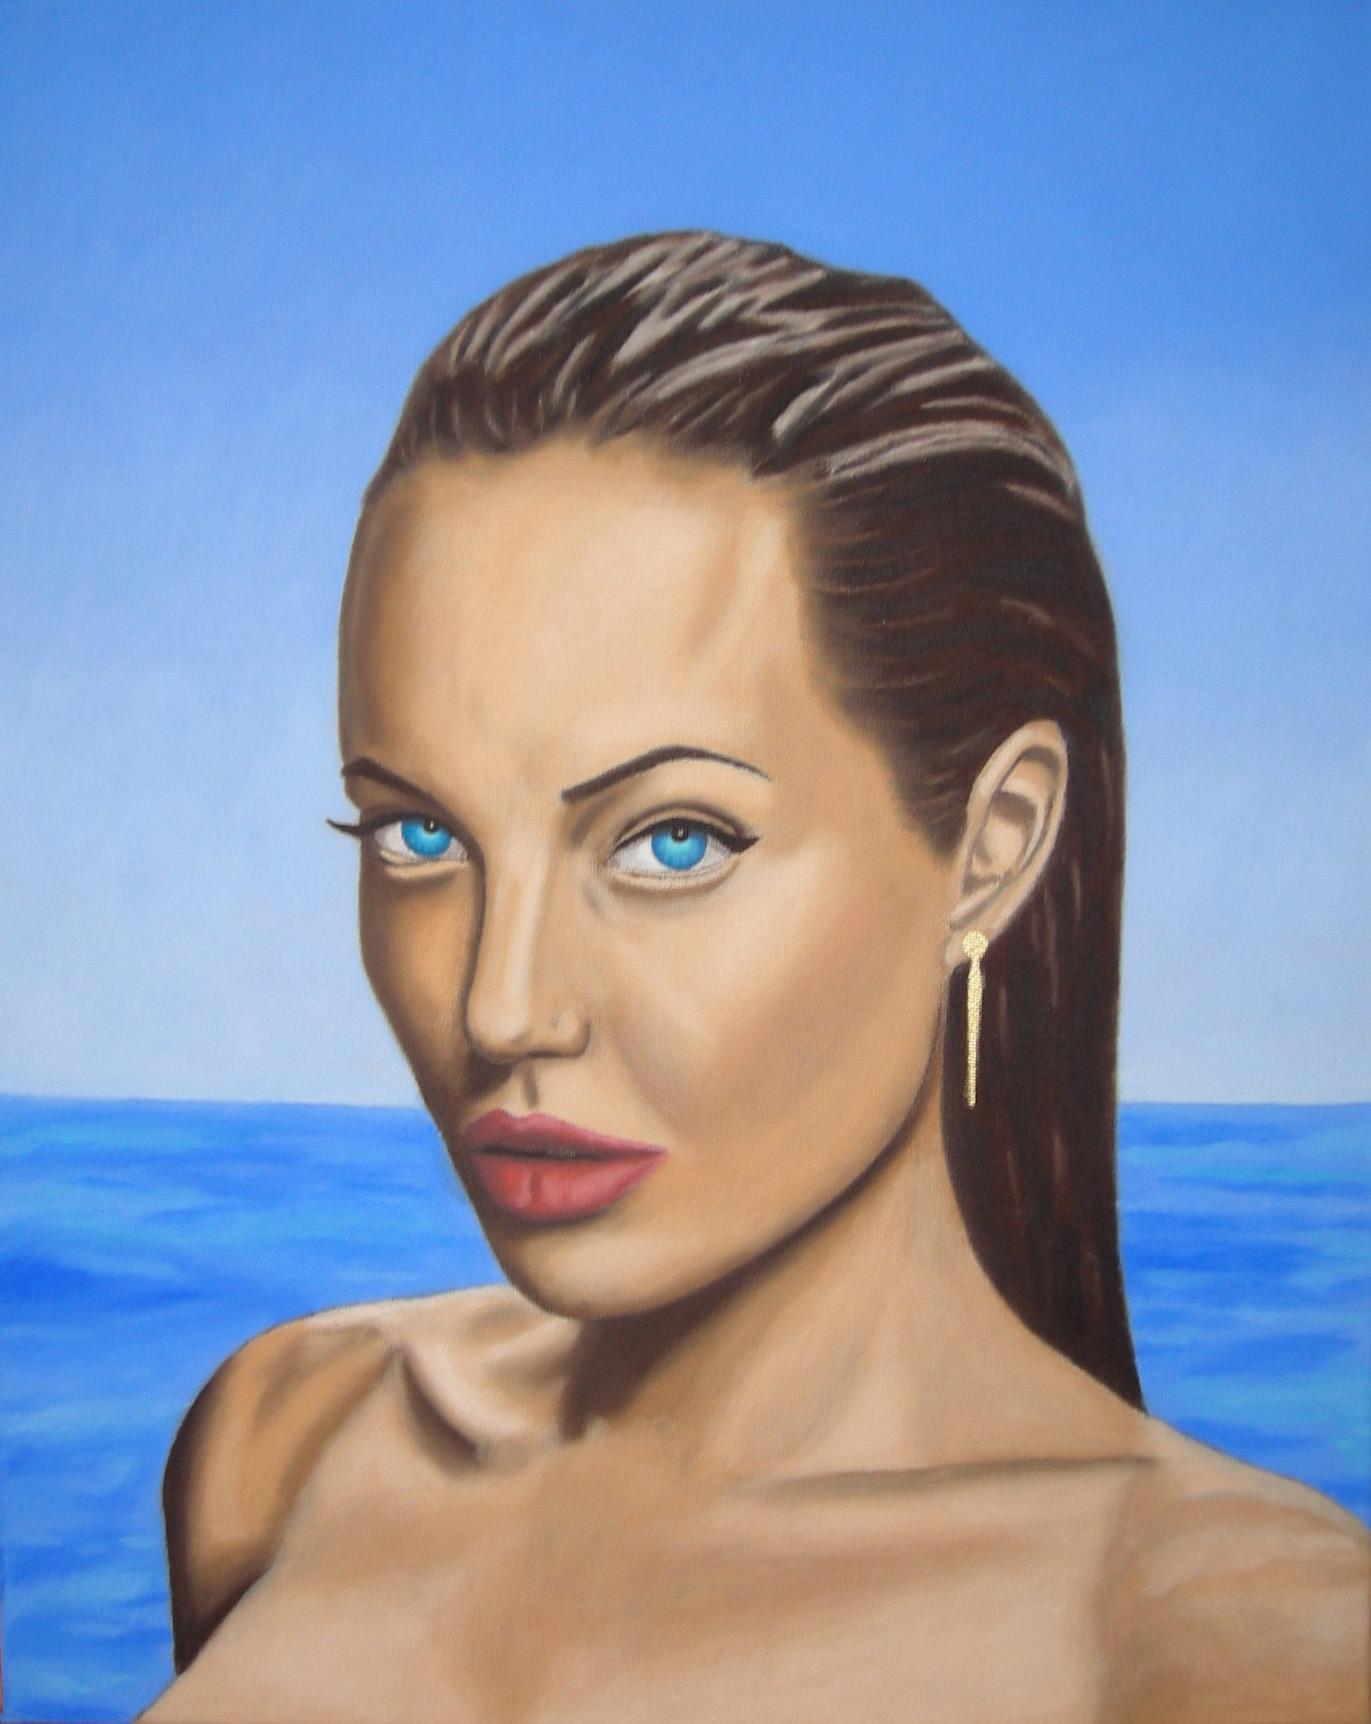 Jolie clipart image download Angelina jolie y clipart - Clip Art Library image download